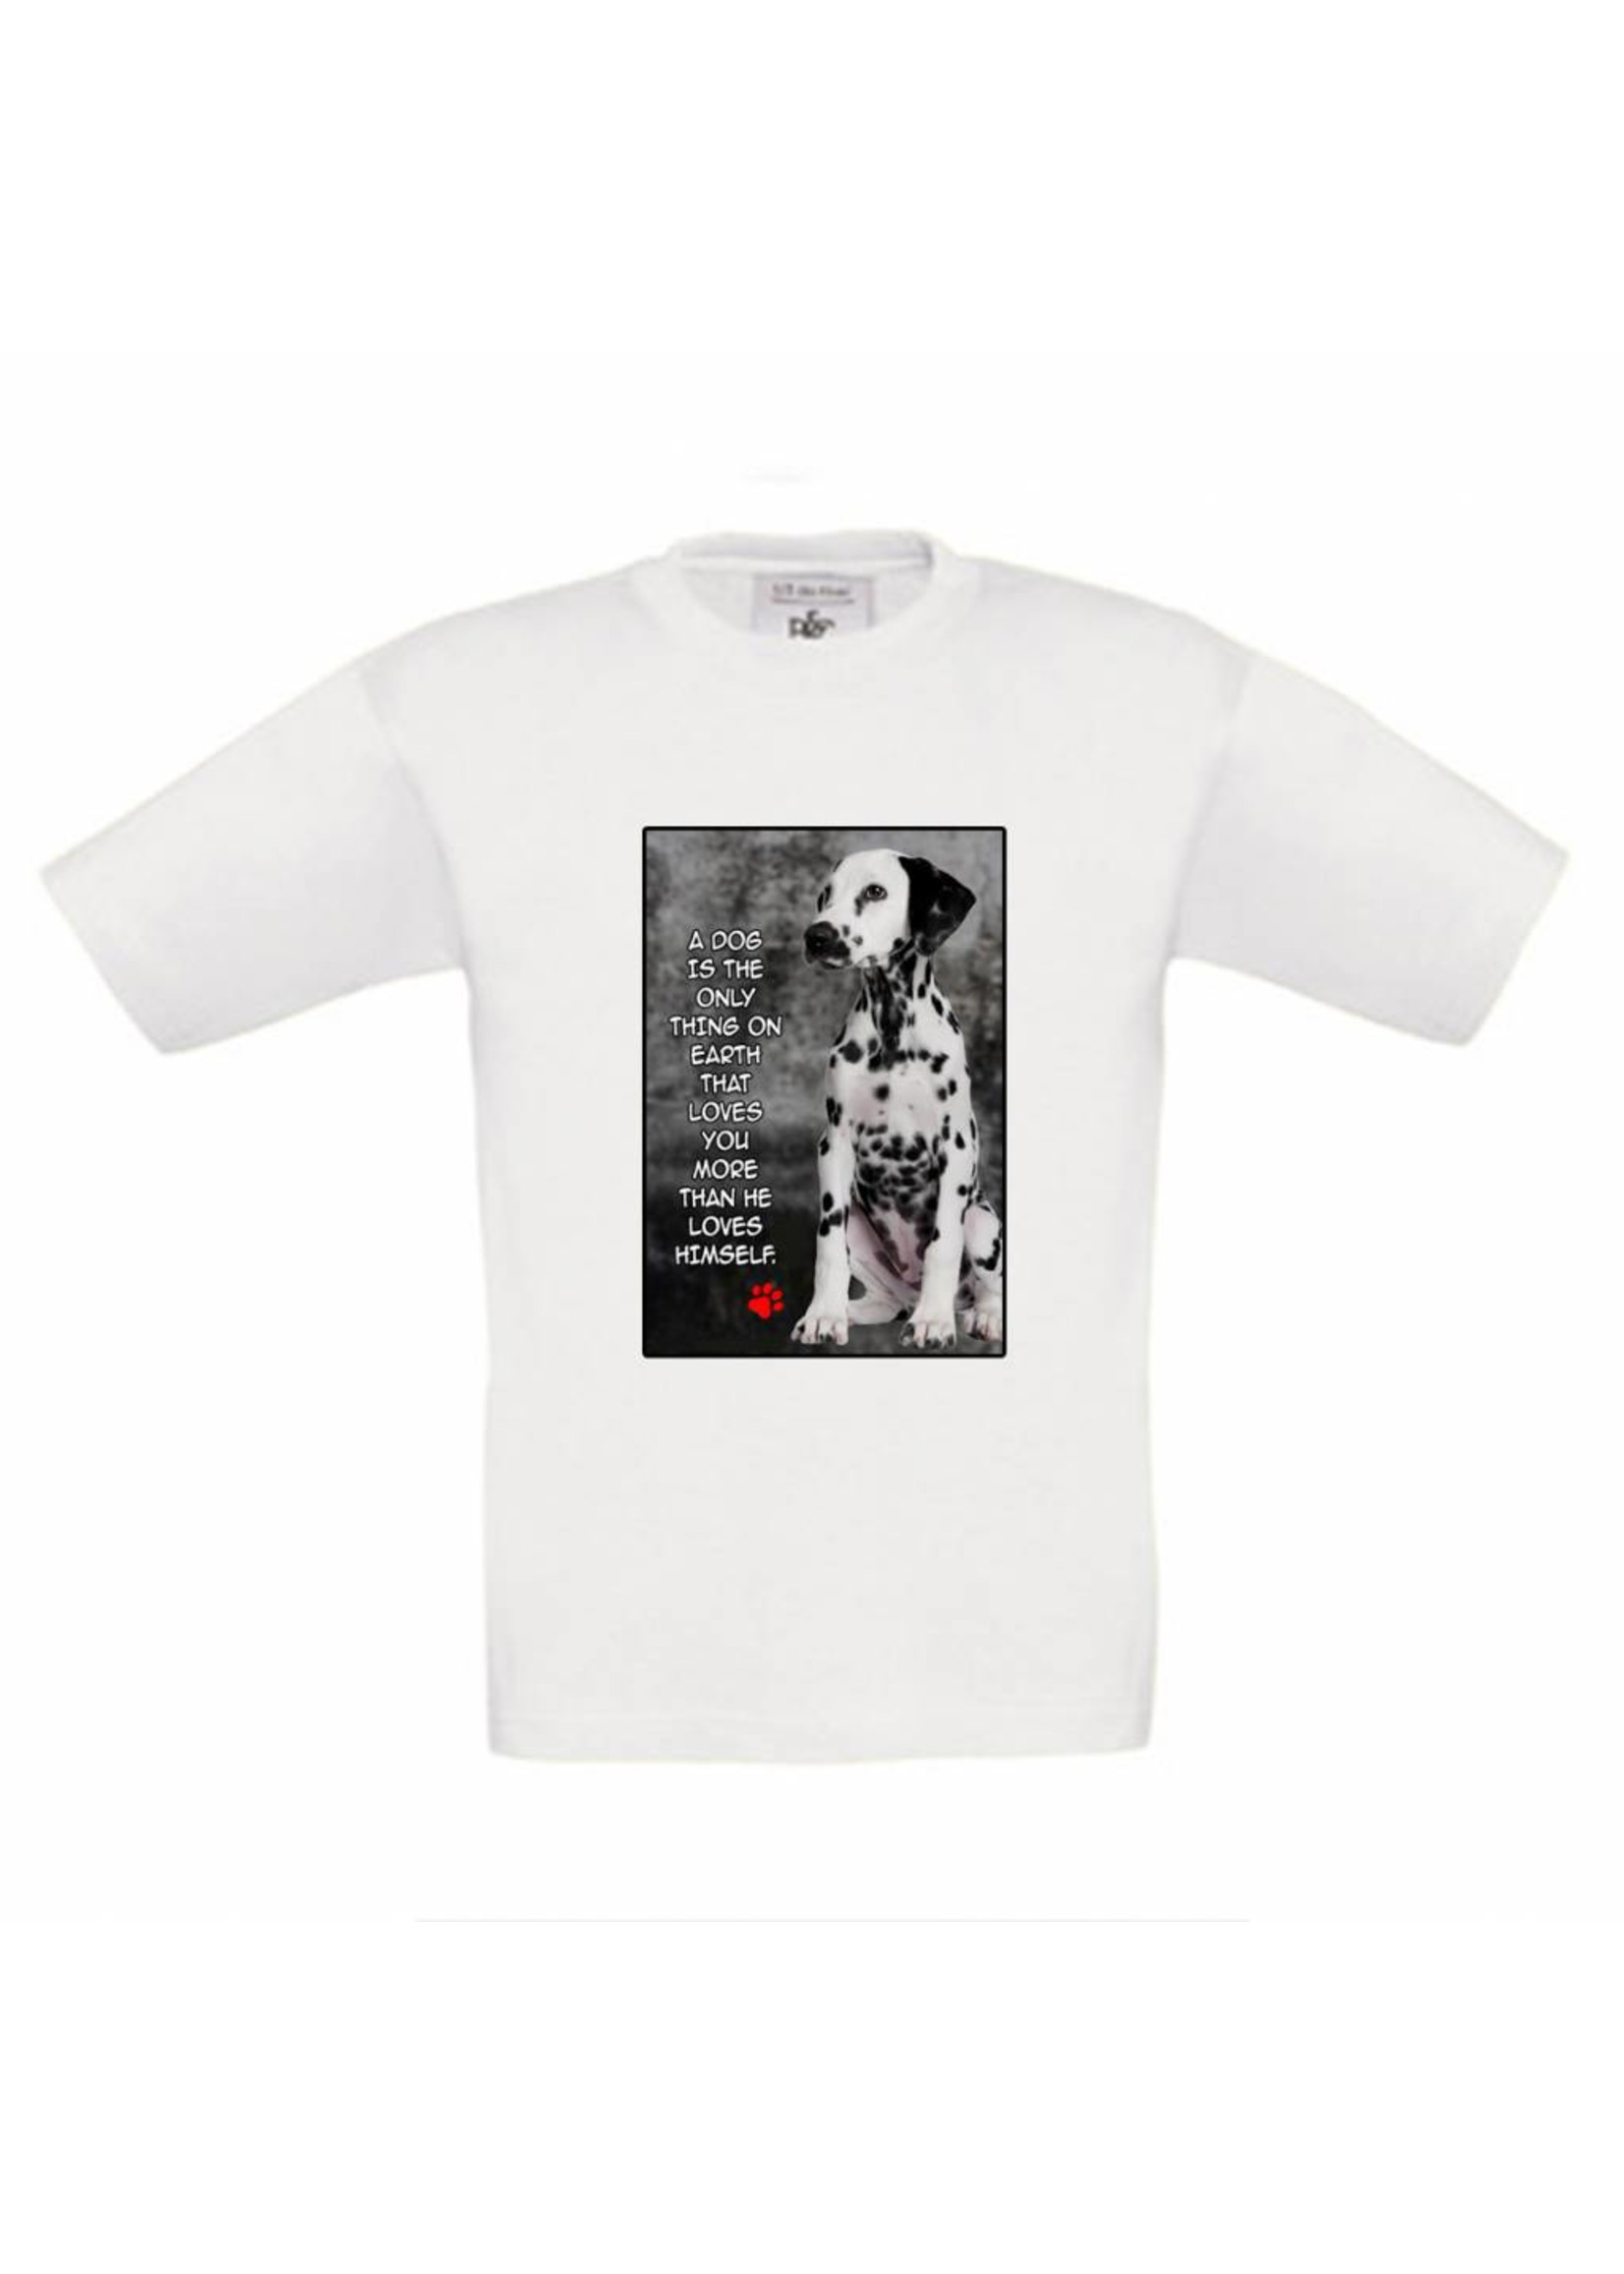 T-shirt dalmatier love quote